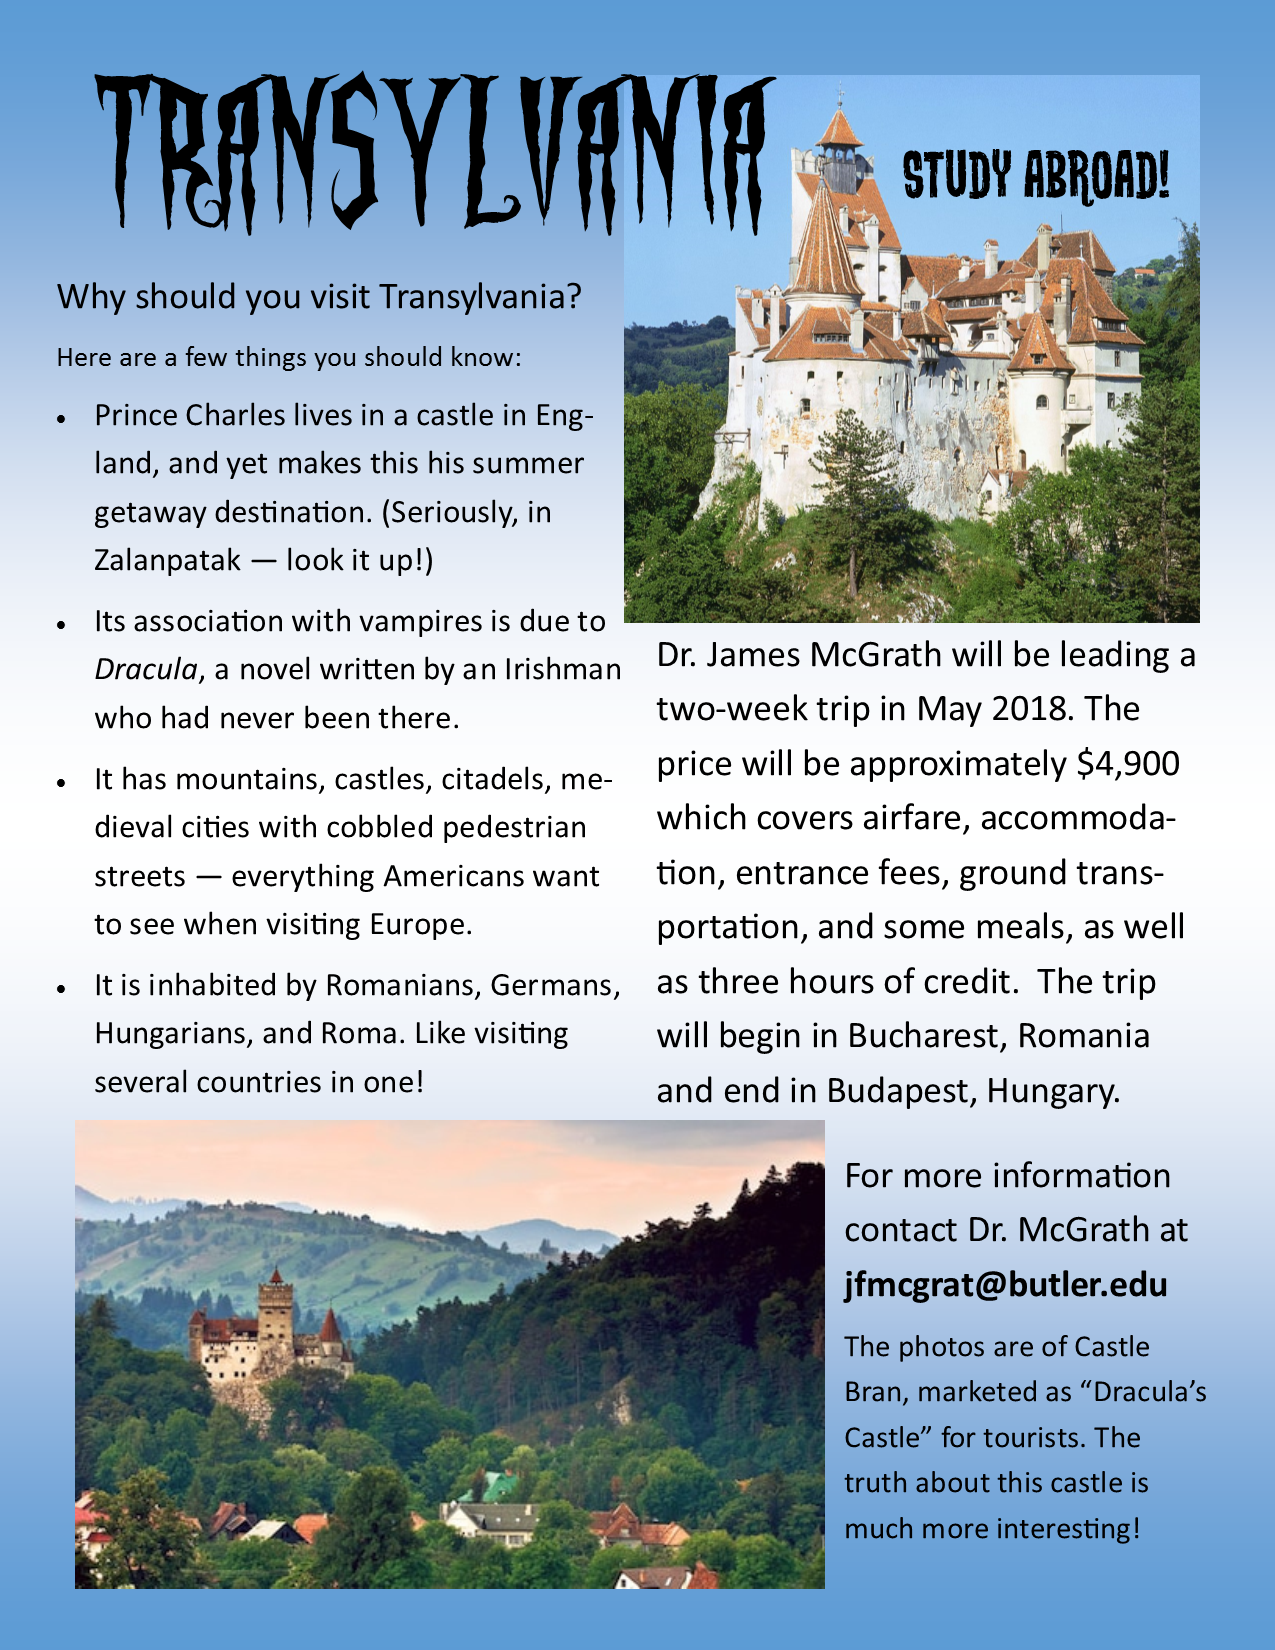 Transylvania poster 4